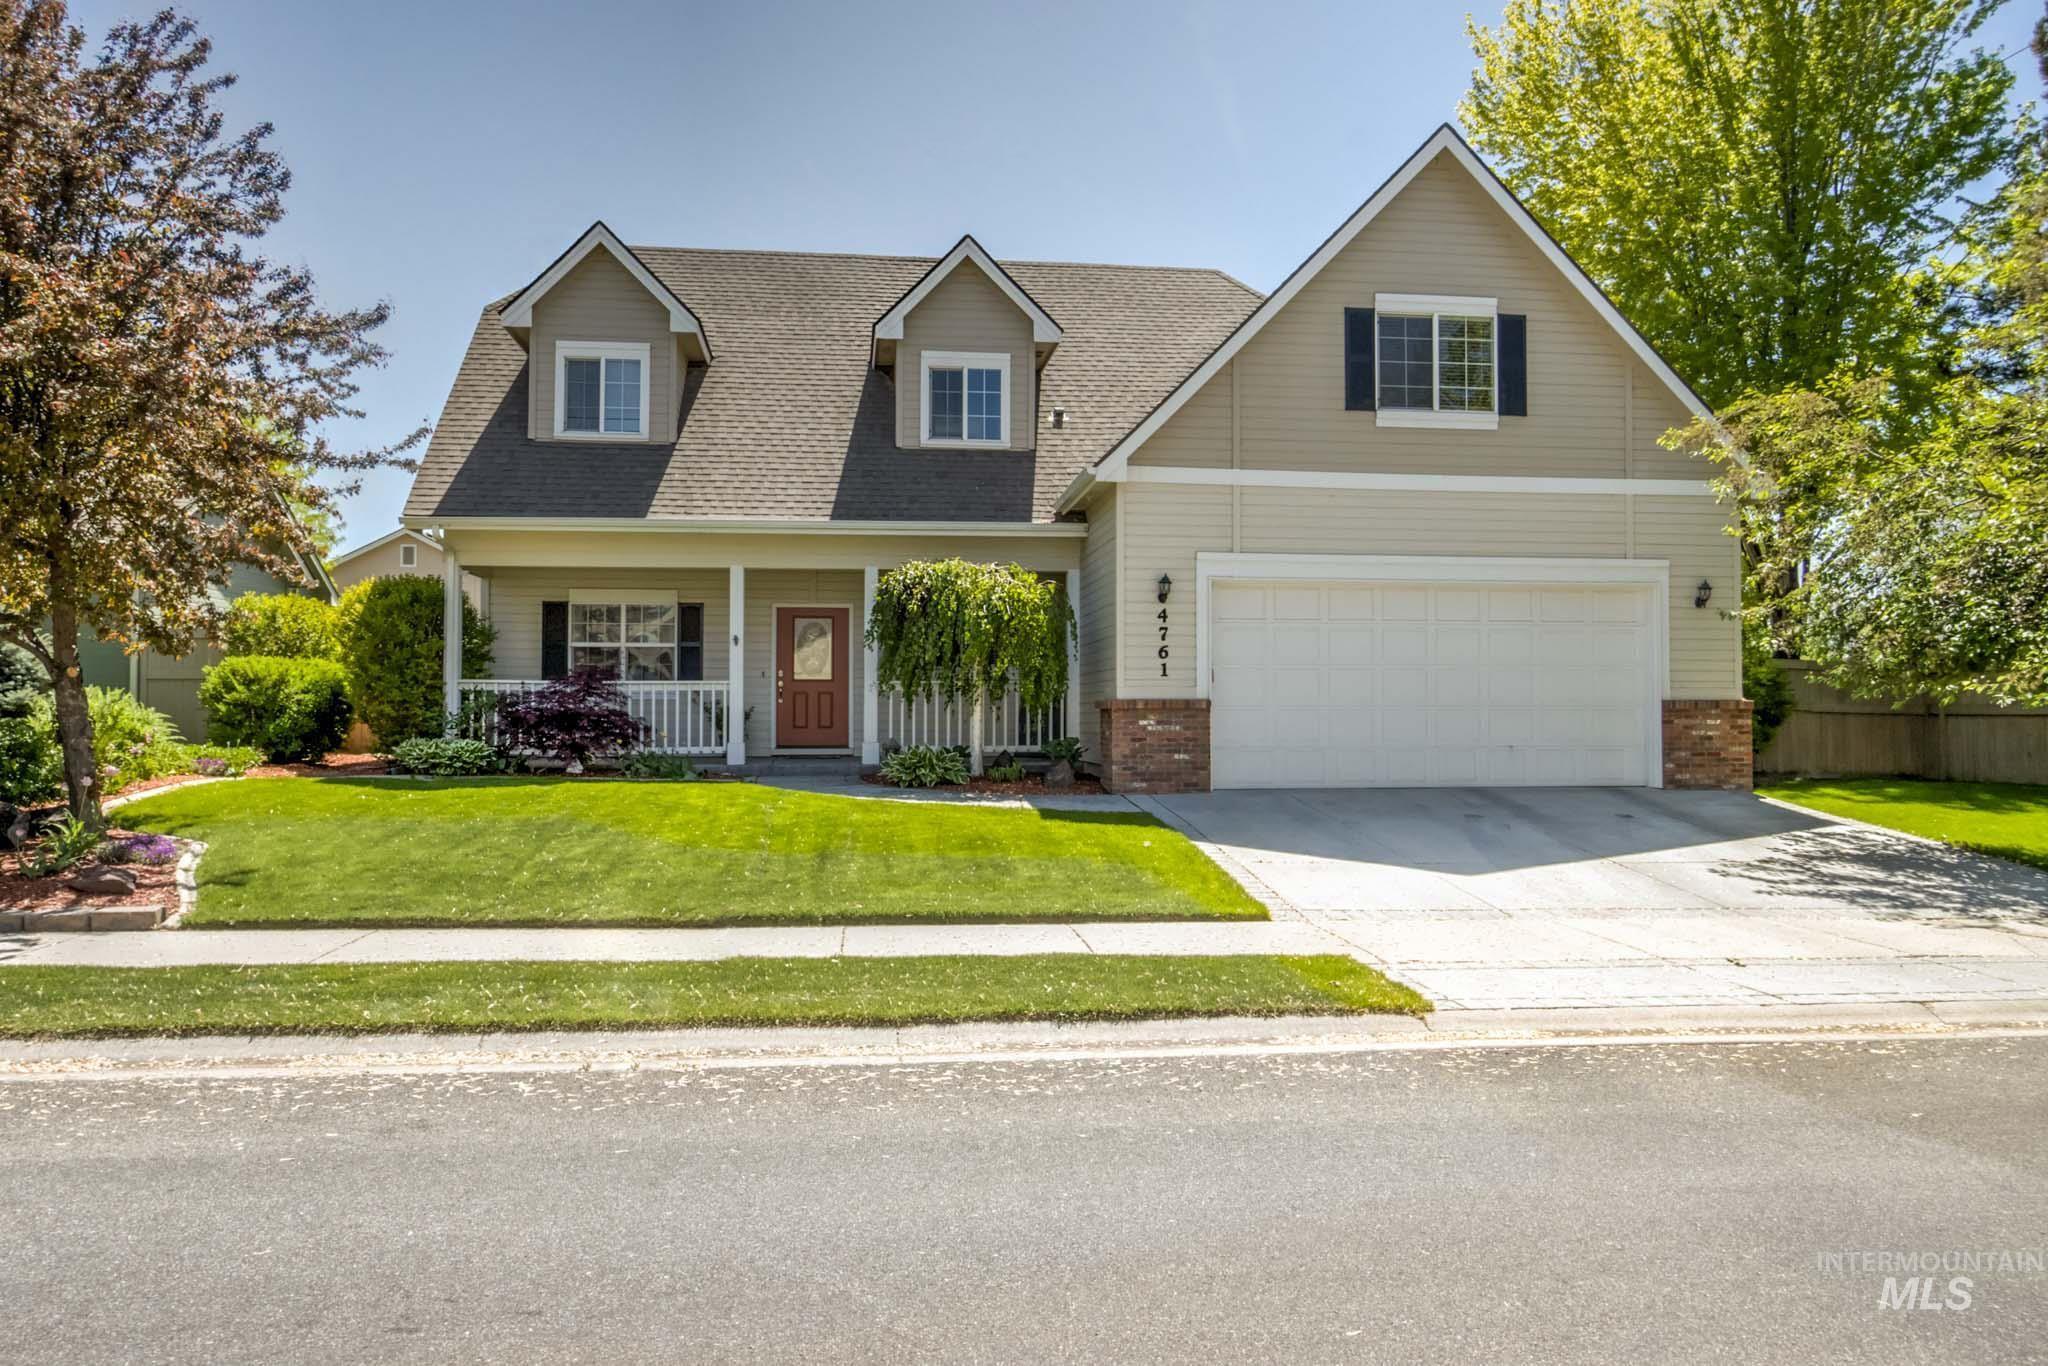 4761 W MOON LAKE Property Photo - Meridian, ID real estate listing